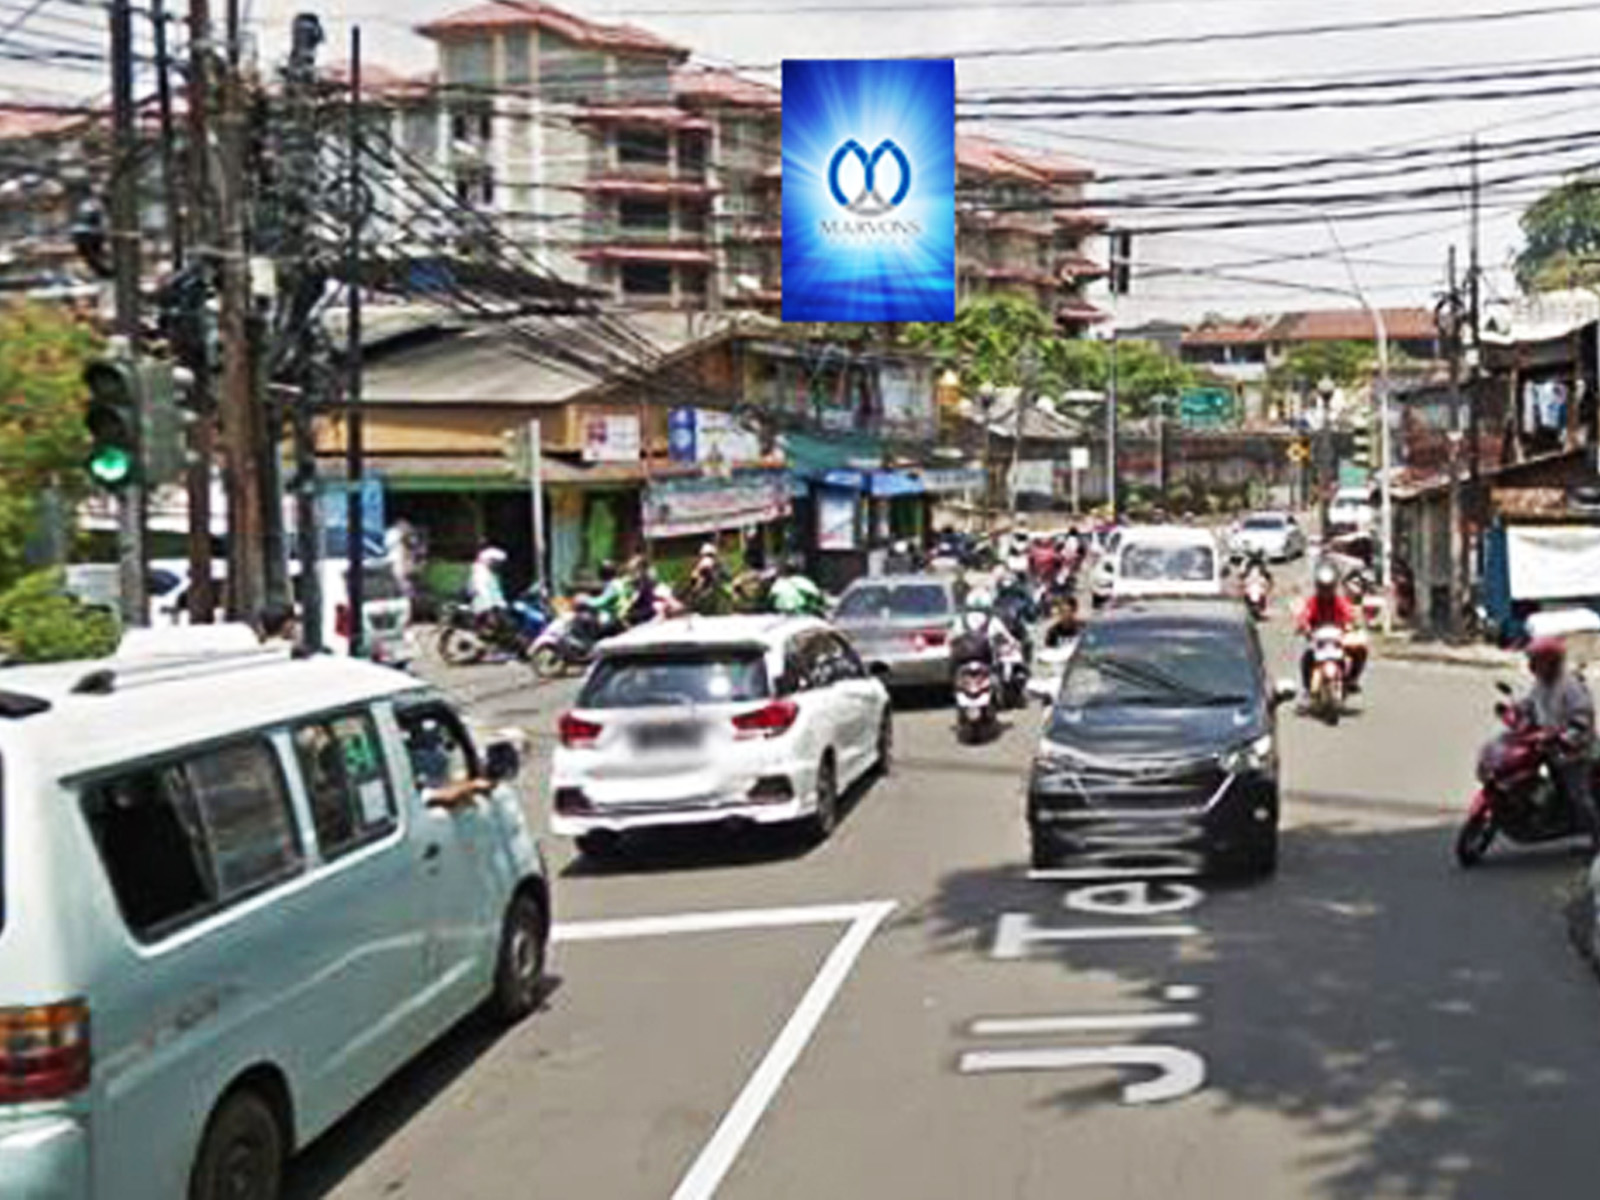 Volume Lalu Lintas Billboard Tebet (Warteg Warmo)